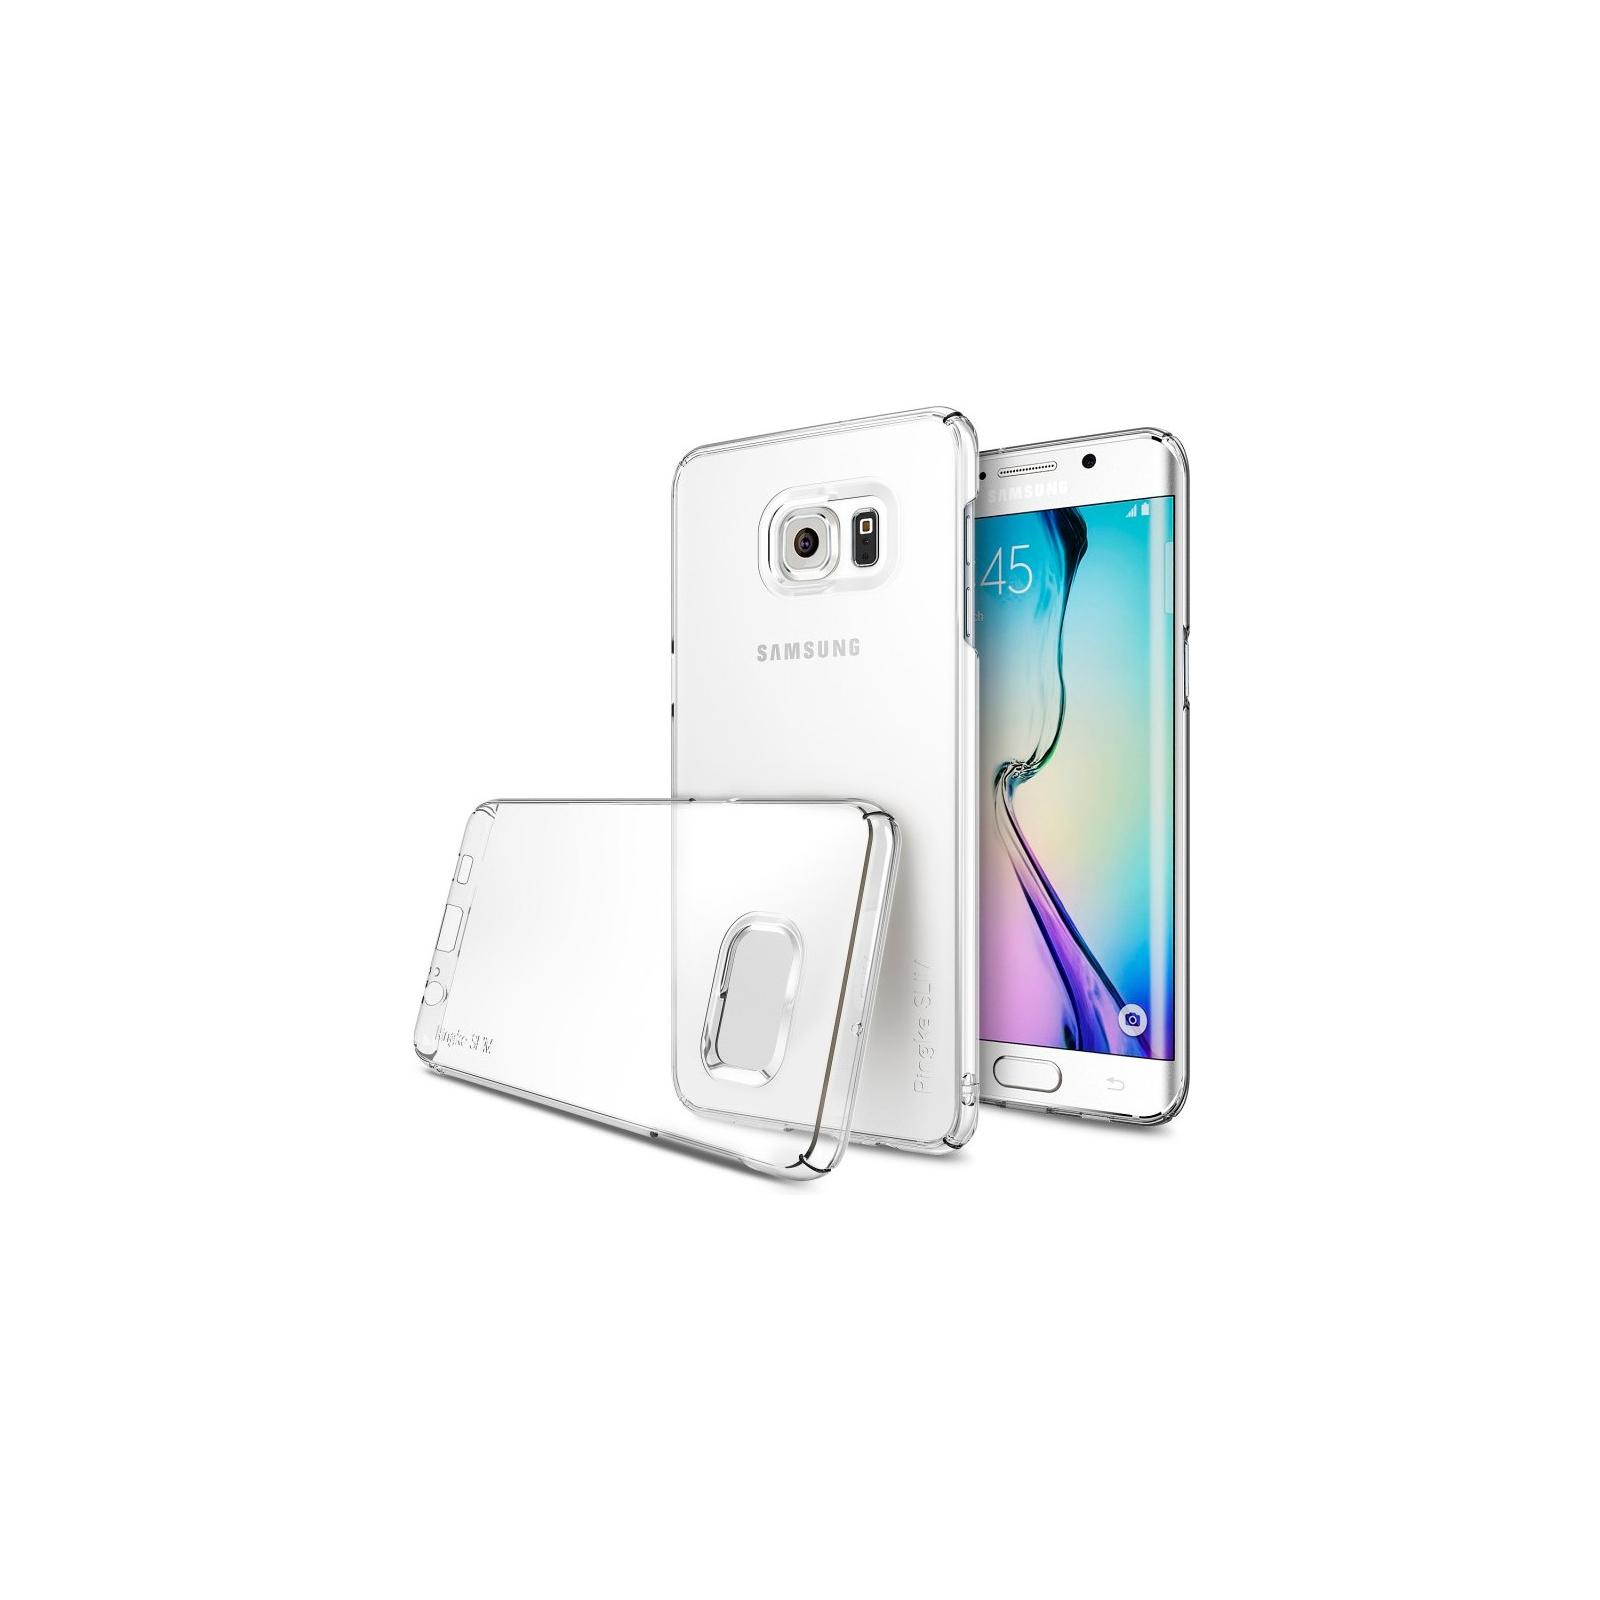 Чехол для моб. телефона Ringke Fusion для Samsung Galaxy S6 Edge Plus (Crystal) (170888)